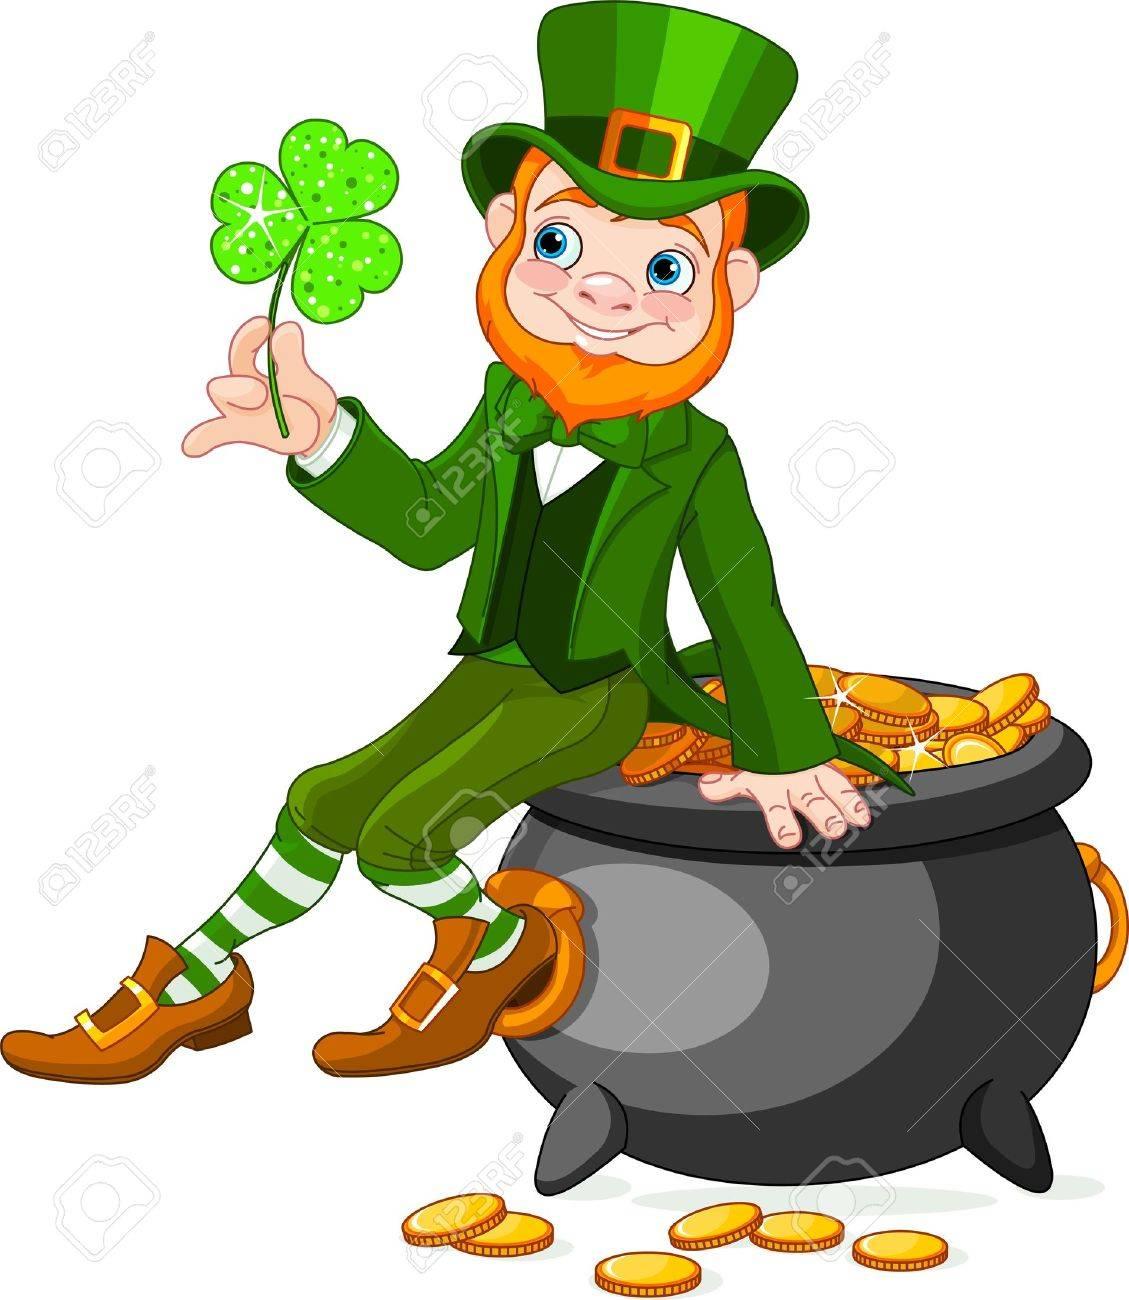 cute cartoon leprechaun sitting on pot of gold royalty free